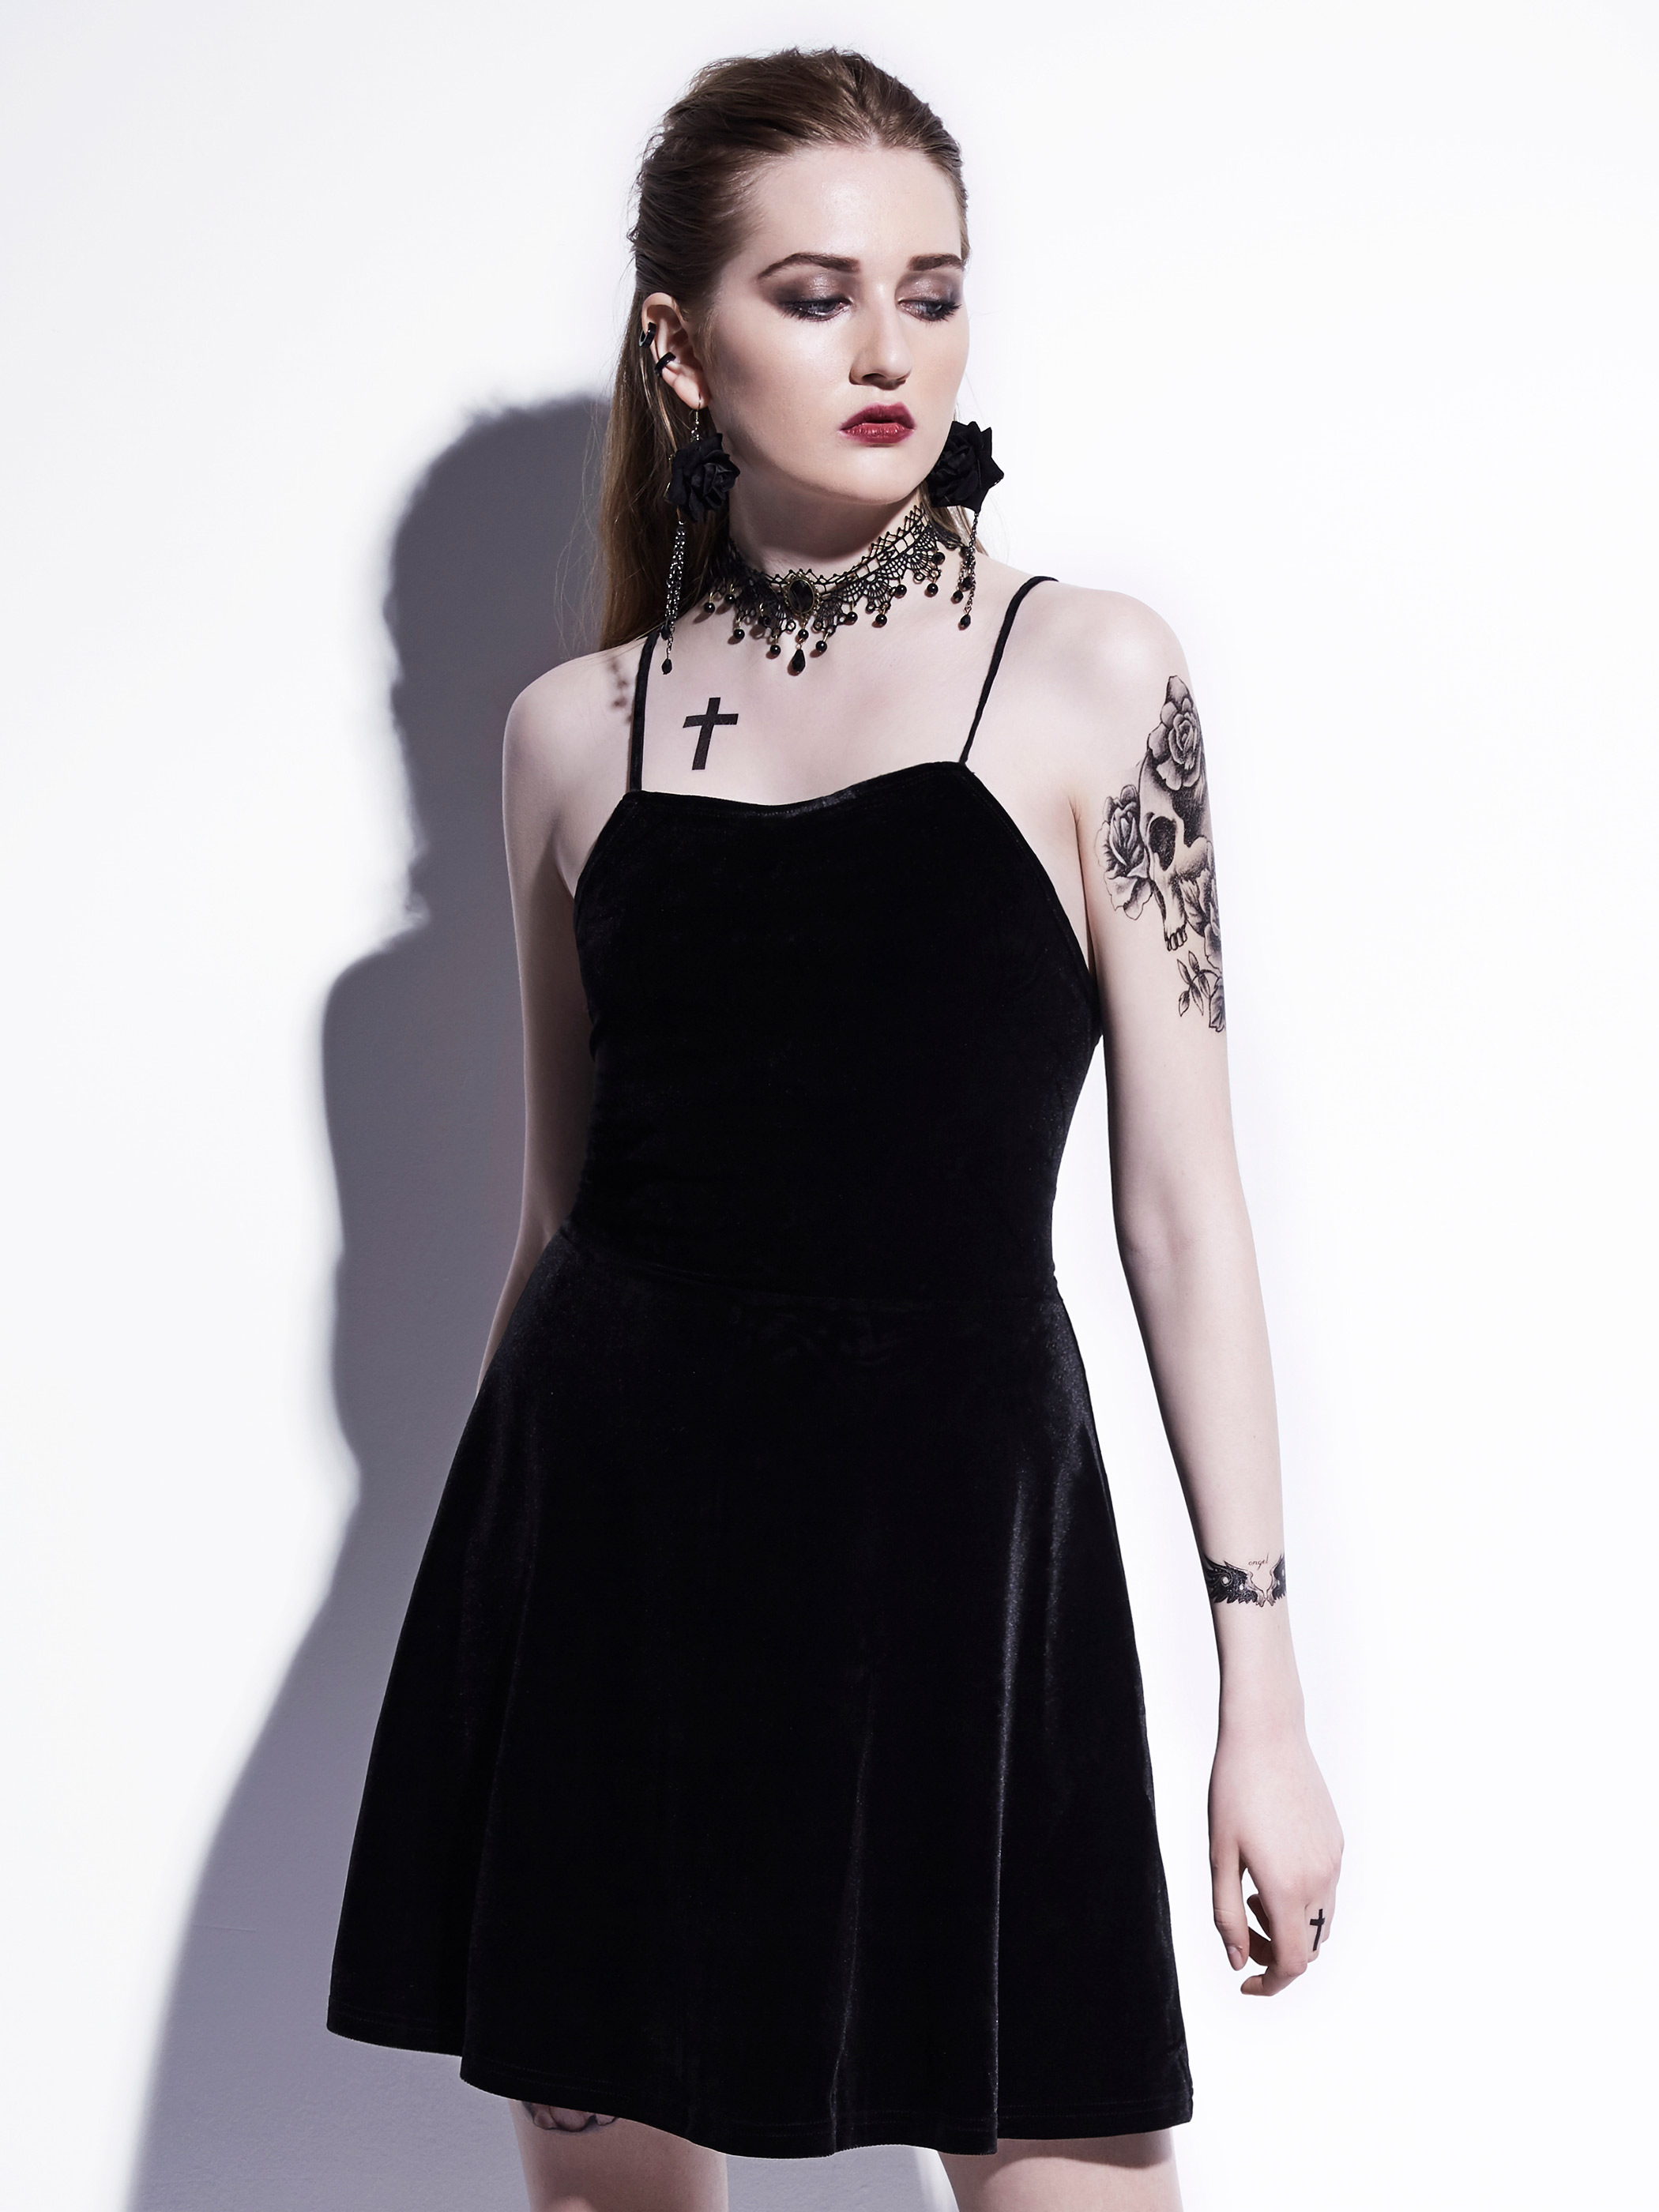 Gothic Mini Dress 2018 Black Summer Women Sexy Short Dress Velvet Backless Lace-Up Spaghetti Strap A-Line Goth Dresses